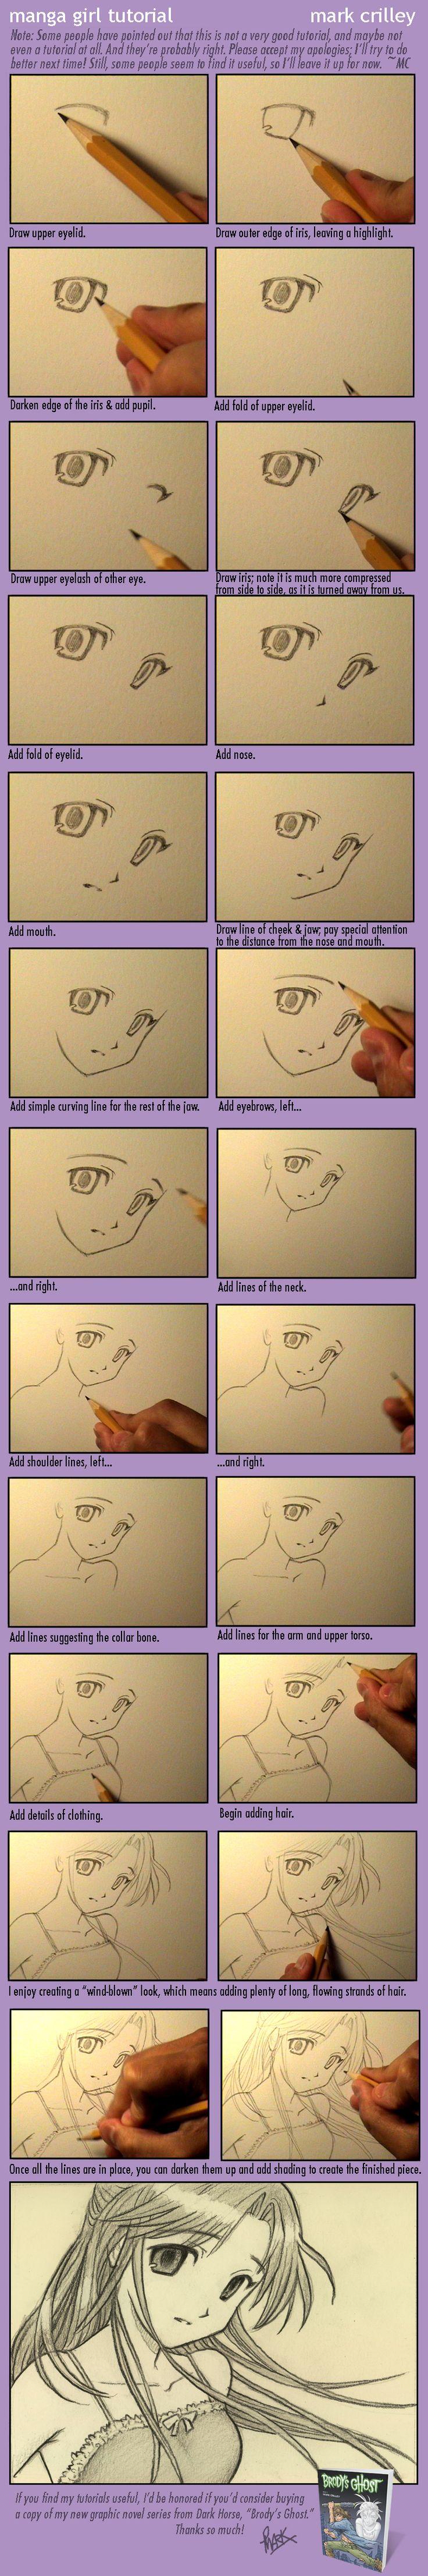 Manga Girl Tutorial by *markcrilley on deviantART